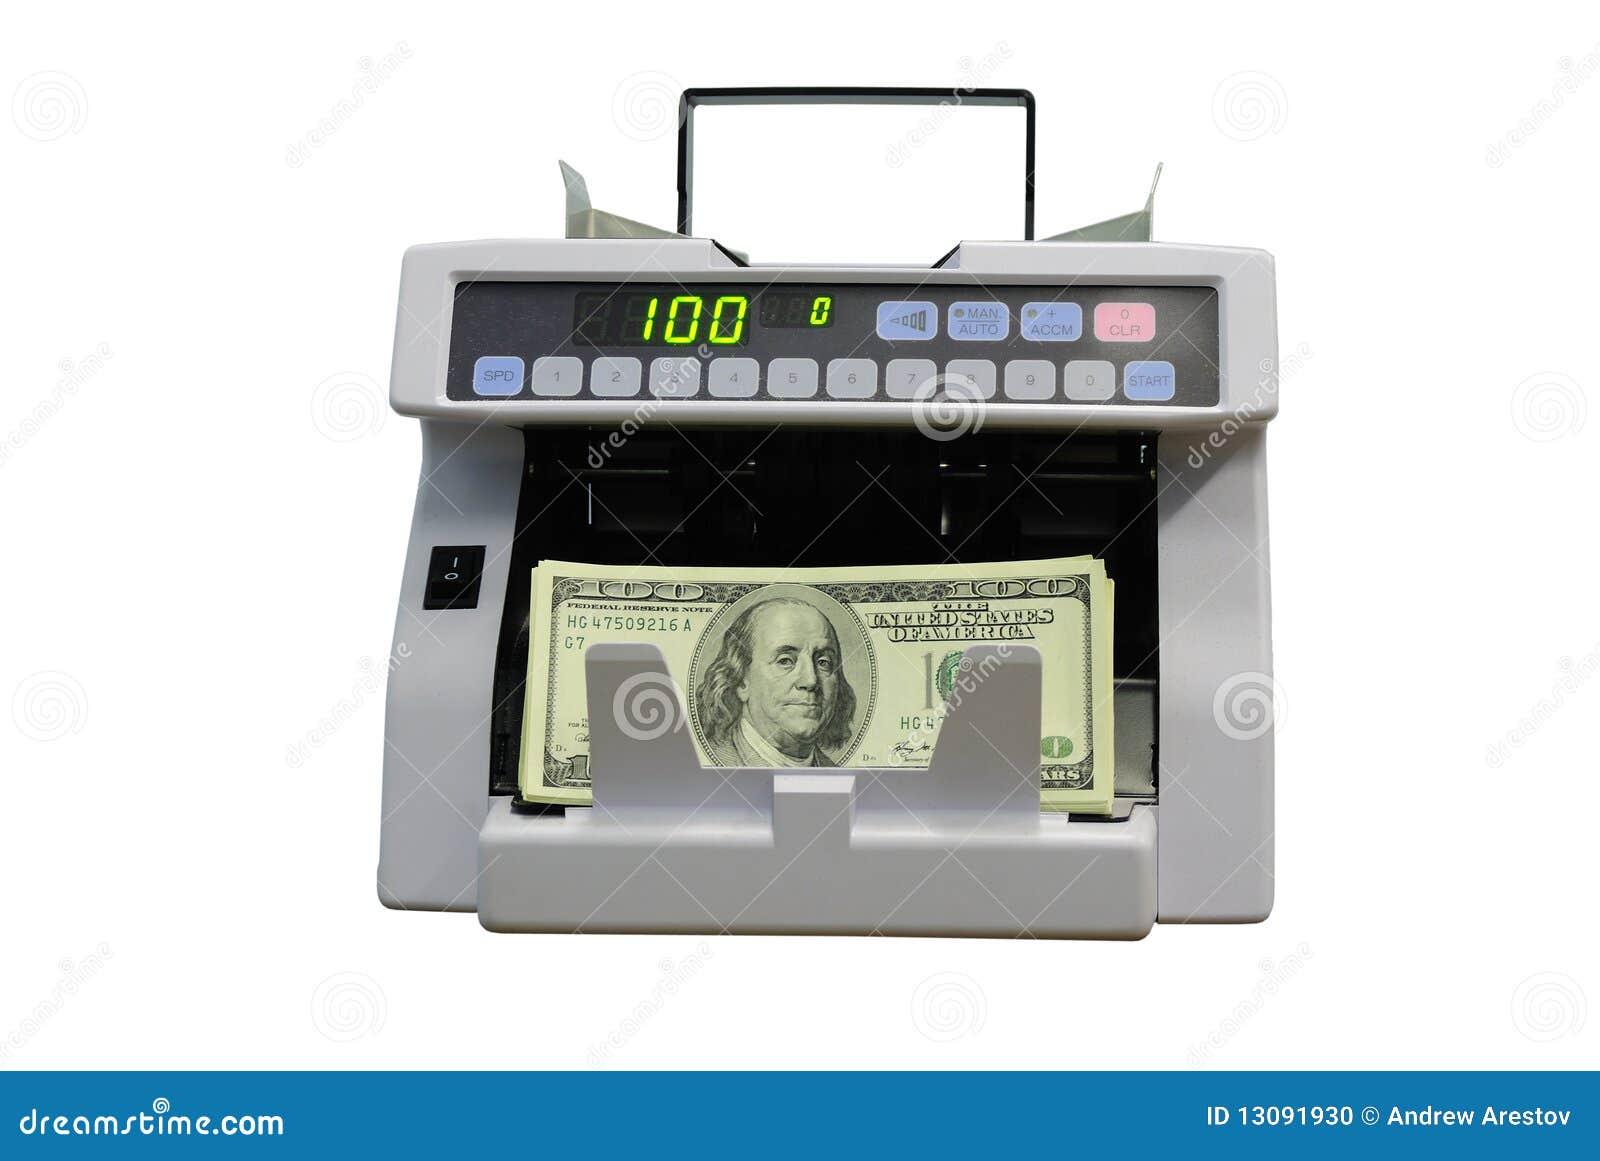 Calculation of money